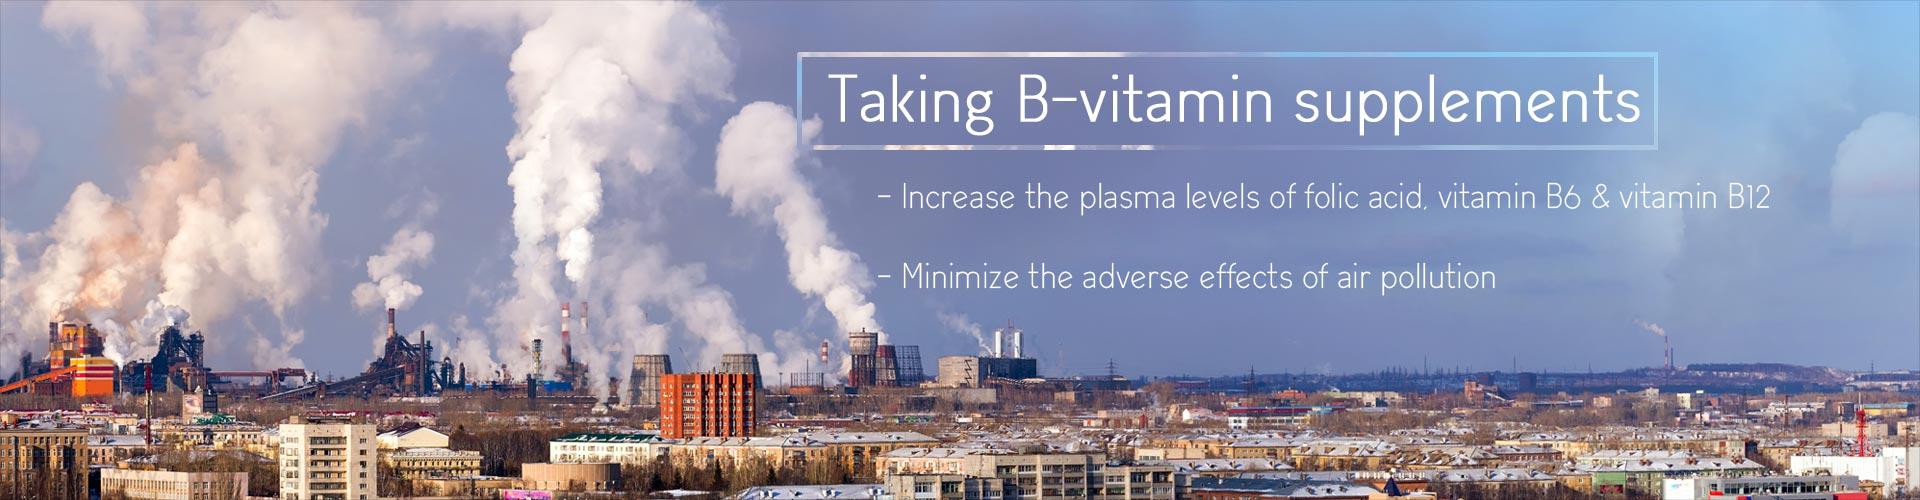 Taking B-vitamin supplements - Increase the plasma levels of folic acid, vitamin B6 & vitamin B12 - Minimize the adverse effects of air pollution